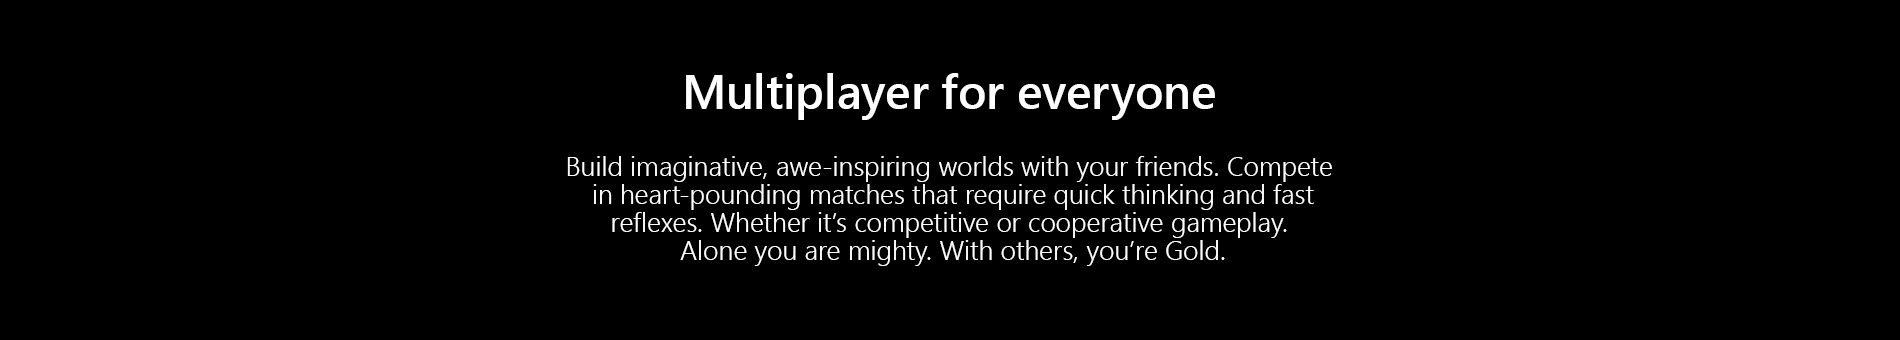 Microsoft Xbox One Games Landing Page Edits  Tile 11